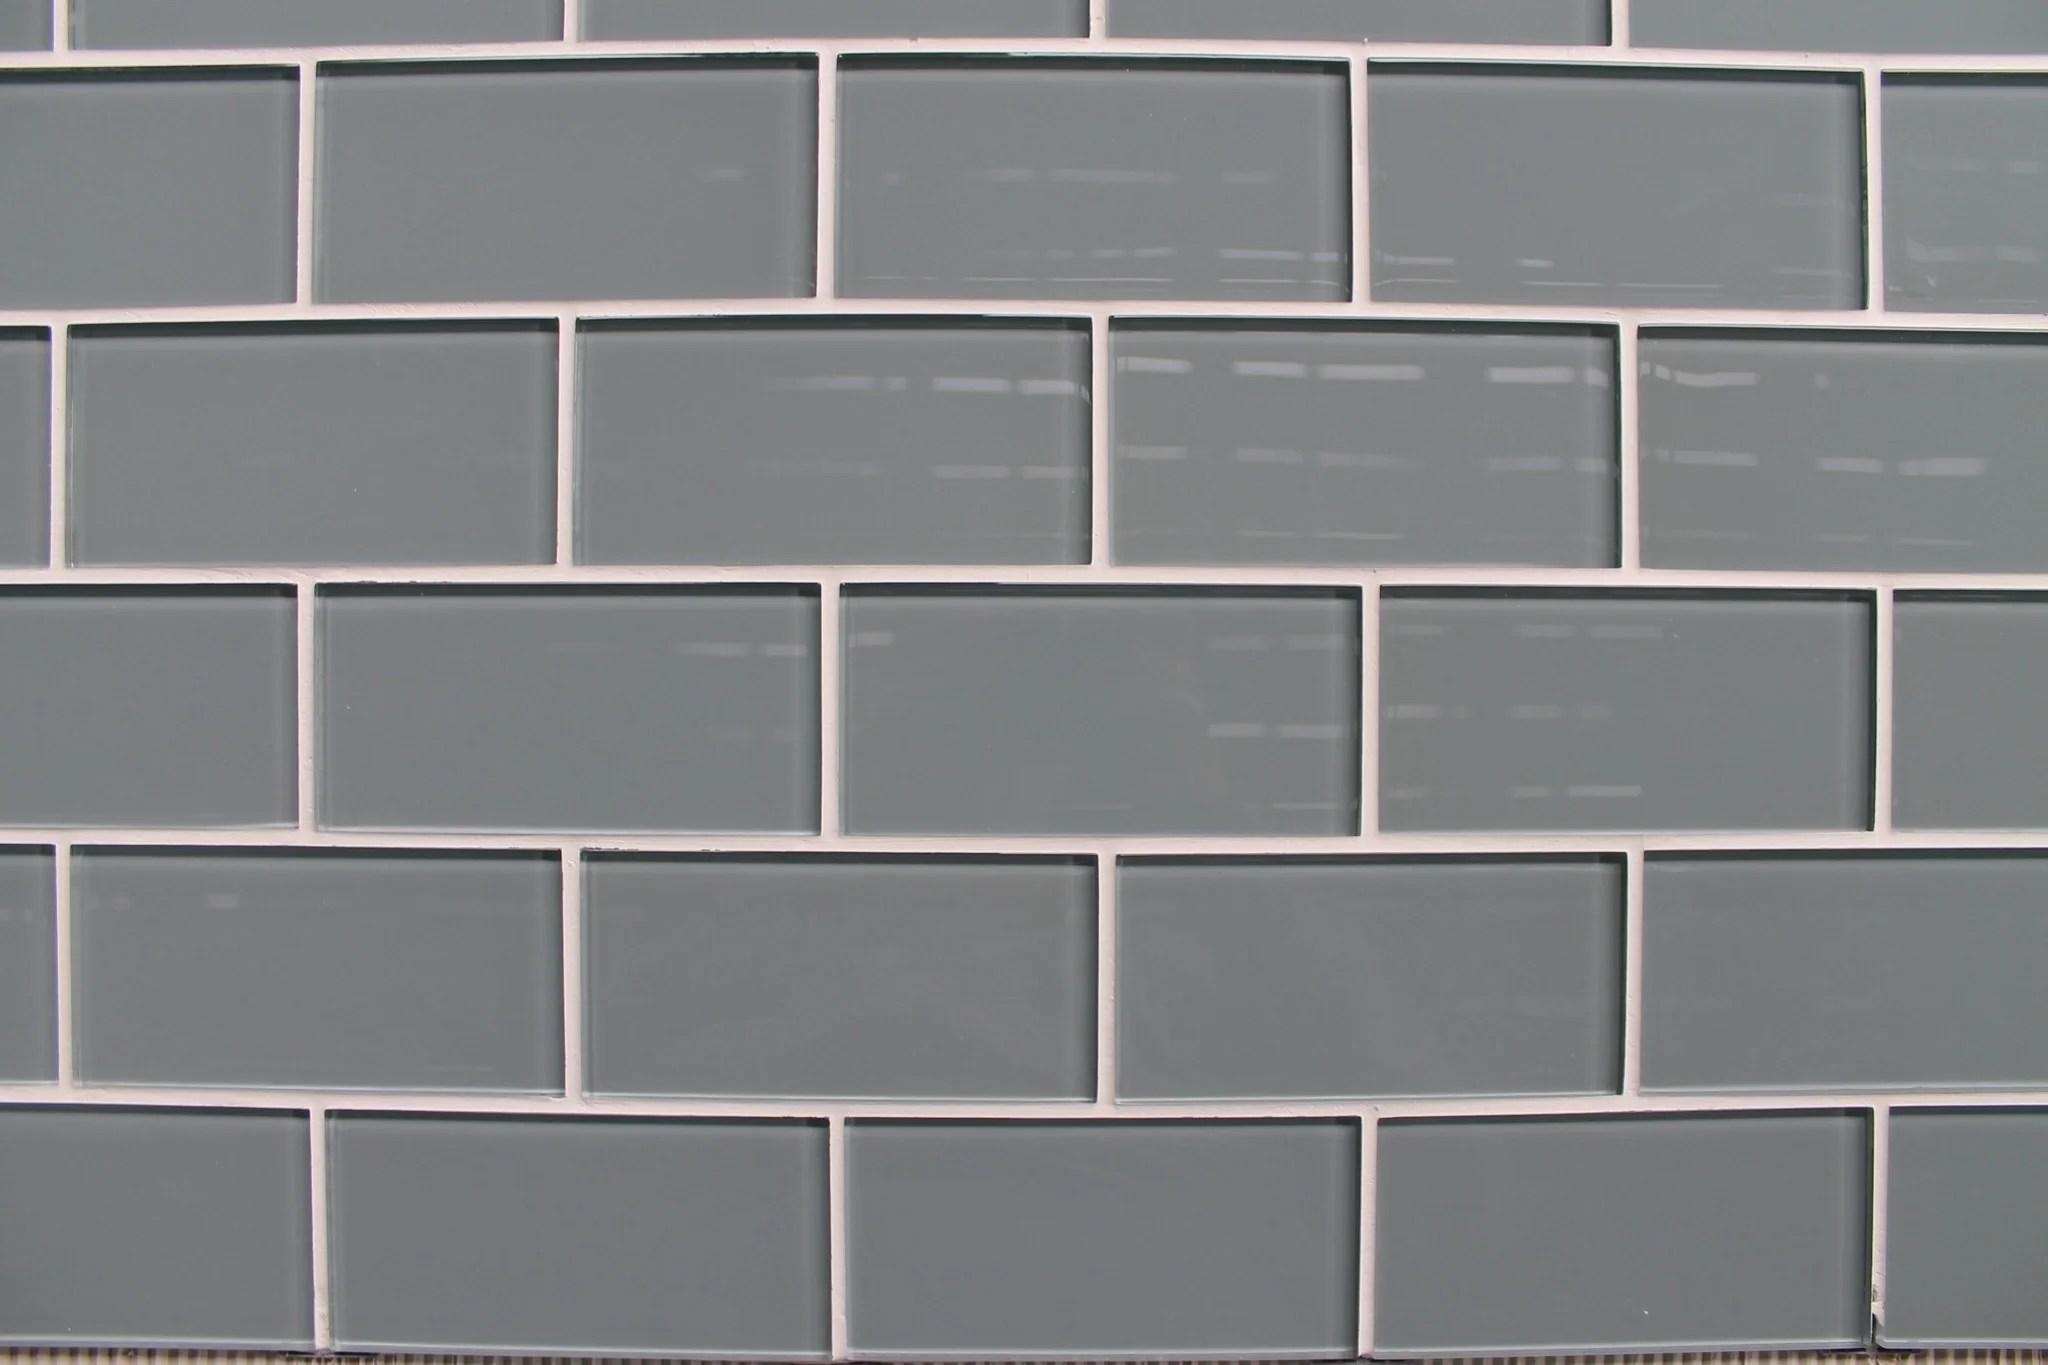 Chimney Smoke Gray 3x6 Glass Subway Tiles  Rocky Point